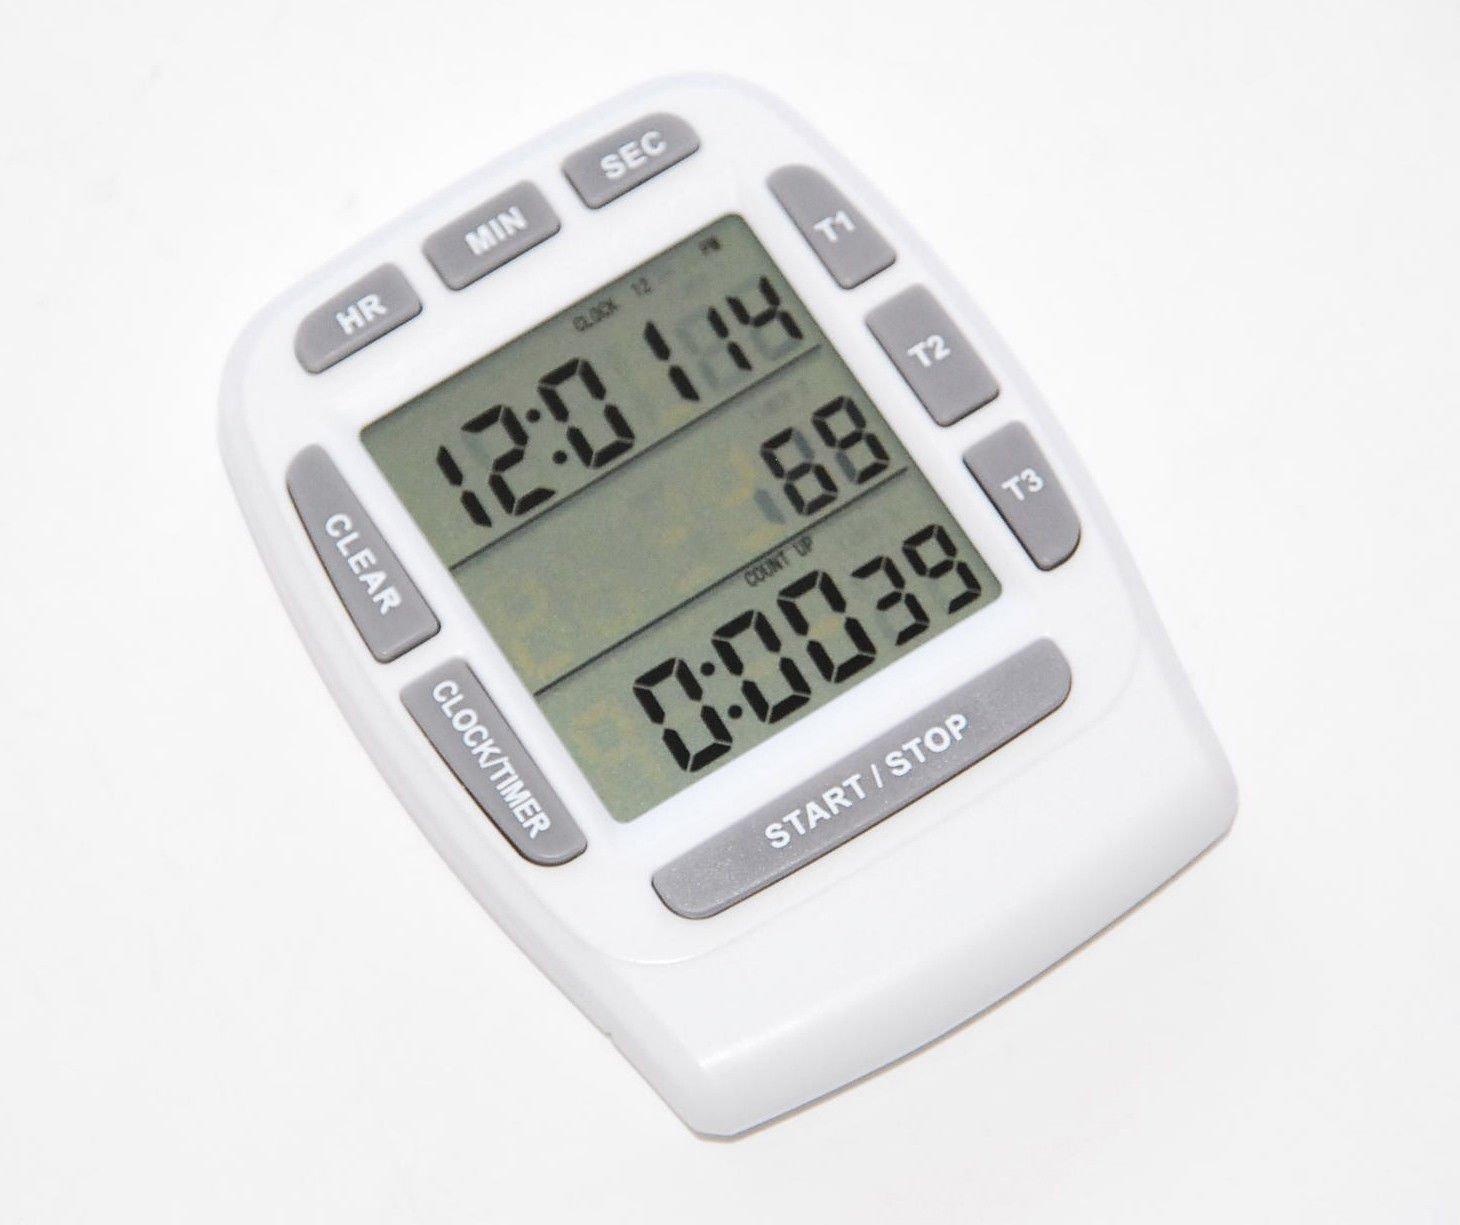 ozg-motors Triple Timer Clock Kitchen 3 Alarm Fridge Magnet Digital Lcd Count Down Egg Bbq at Sears.com